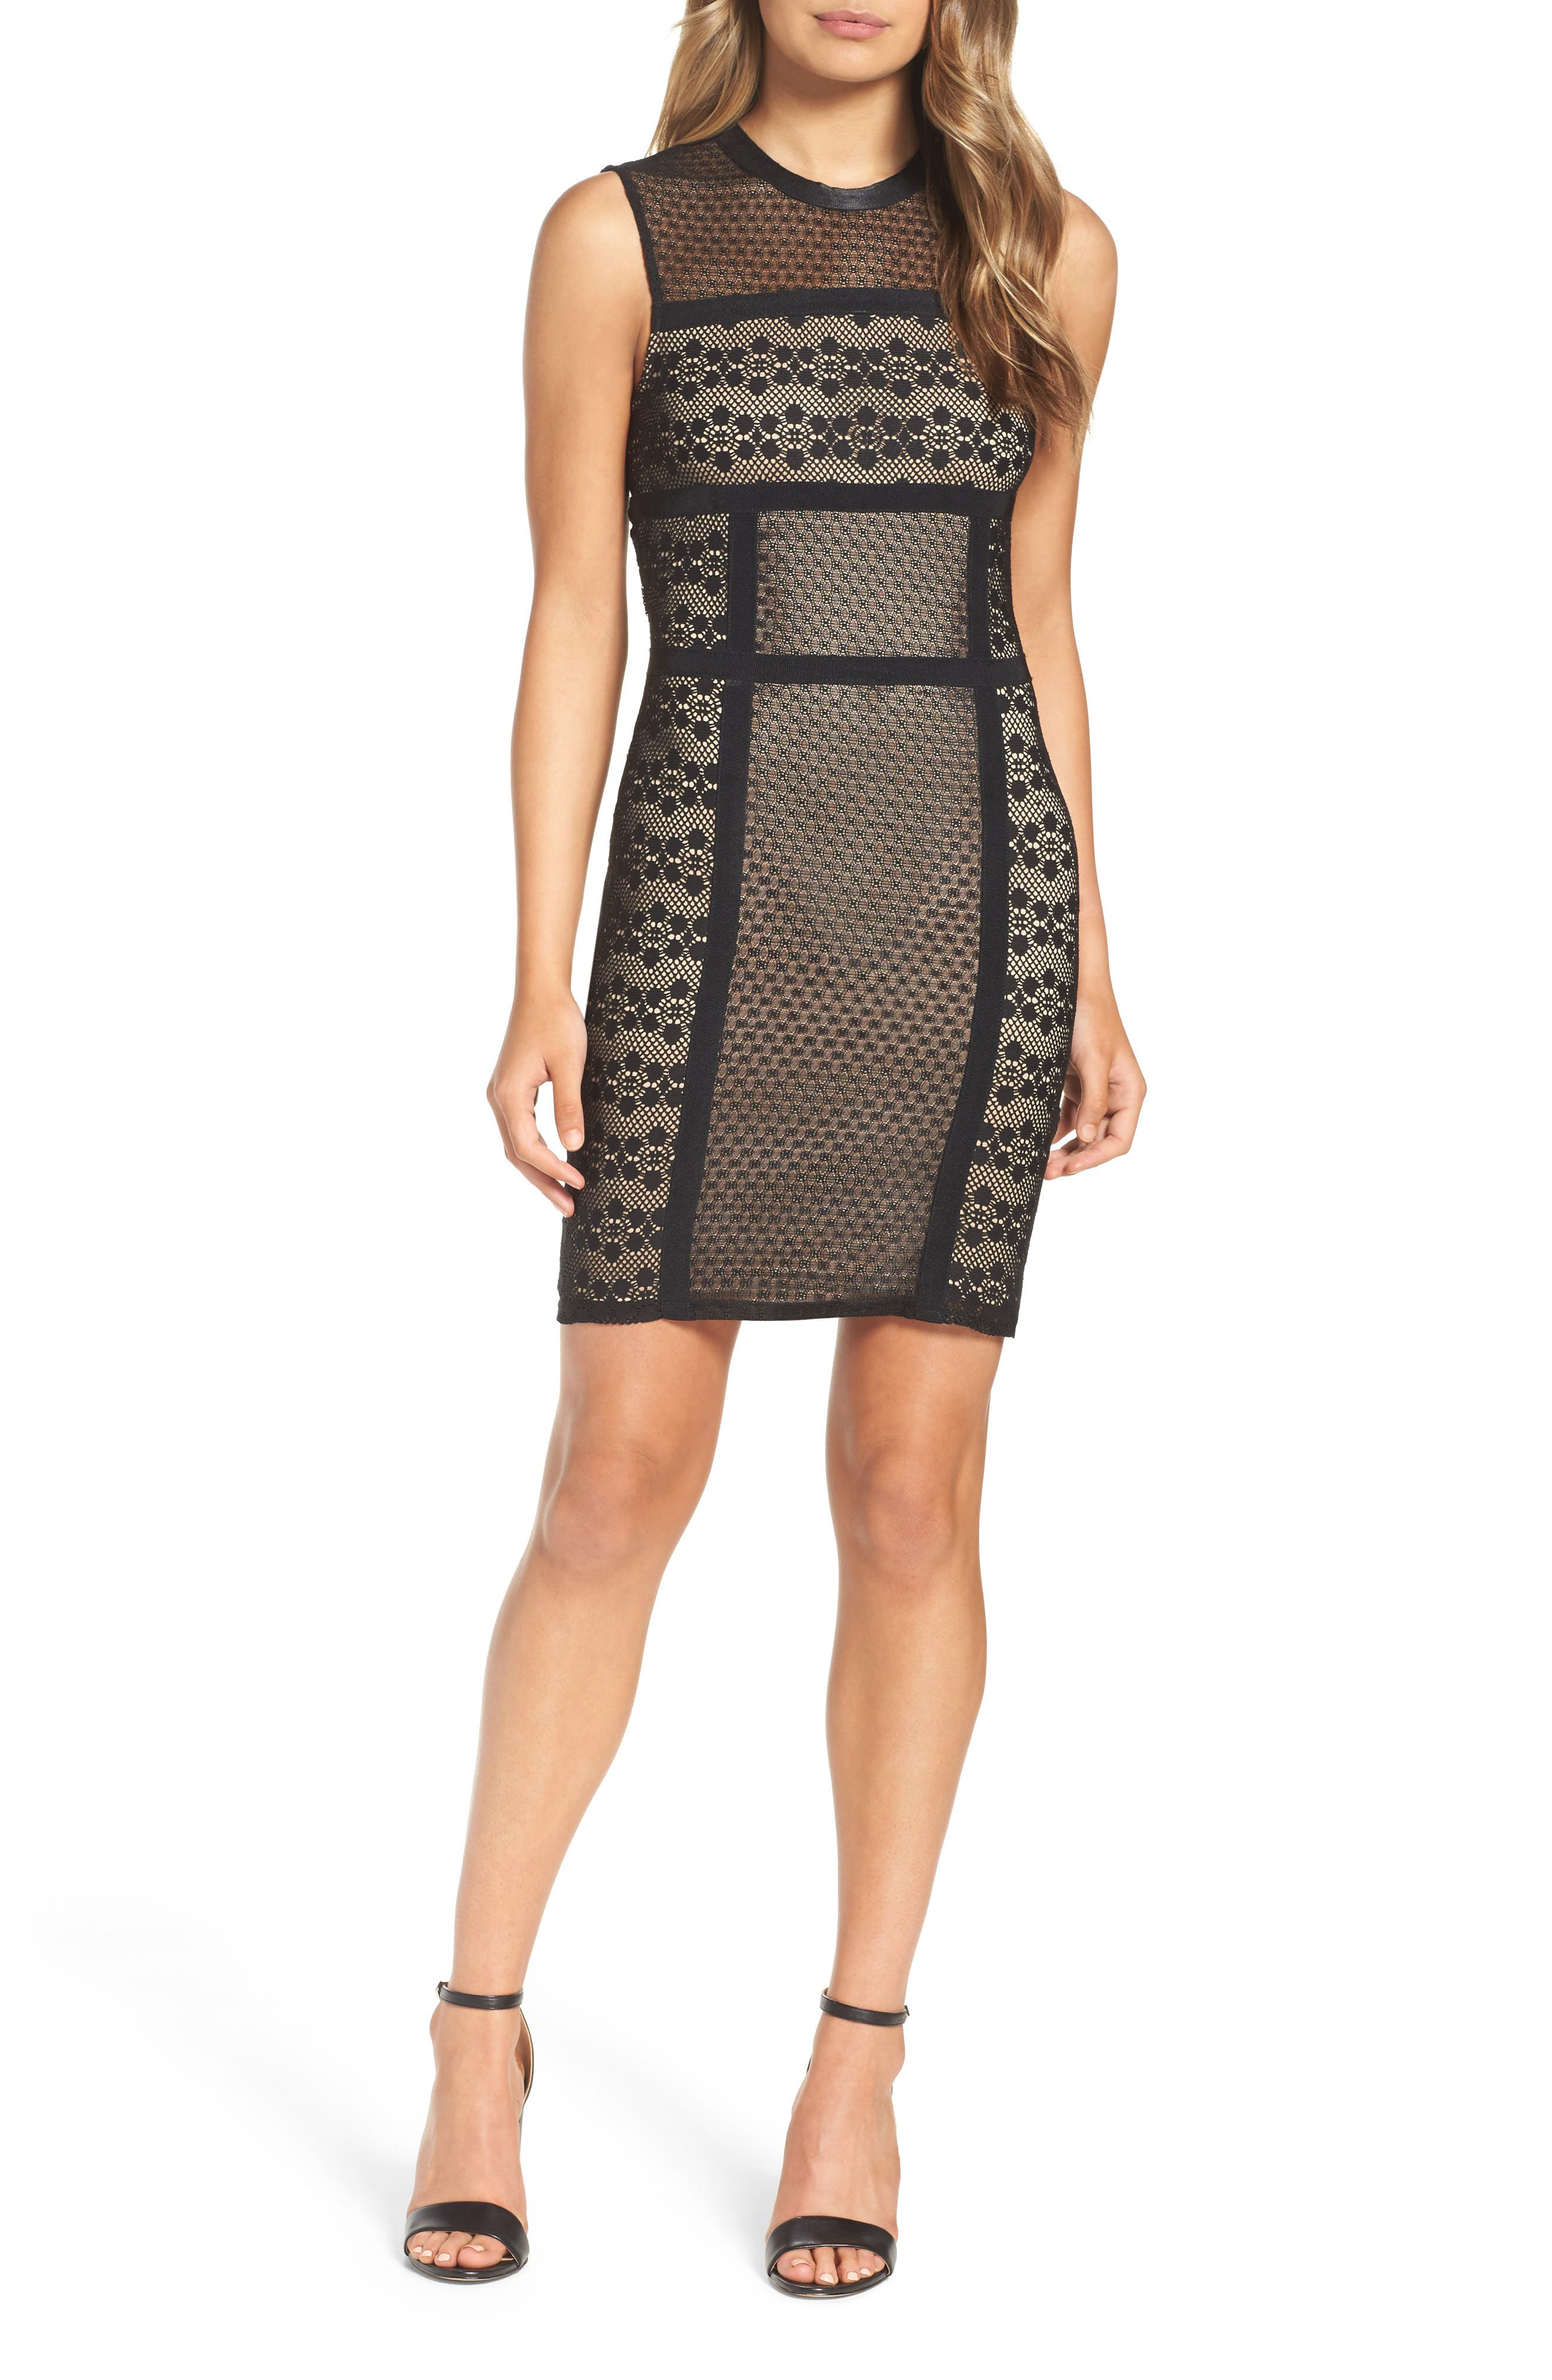 Hola Mamacita Body-Con Dress,                             Alternate thumbnail 4, color,                             Black